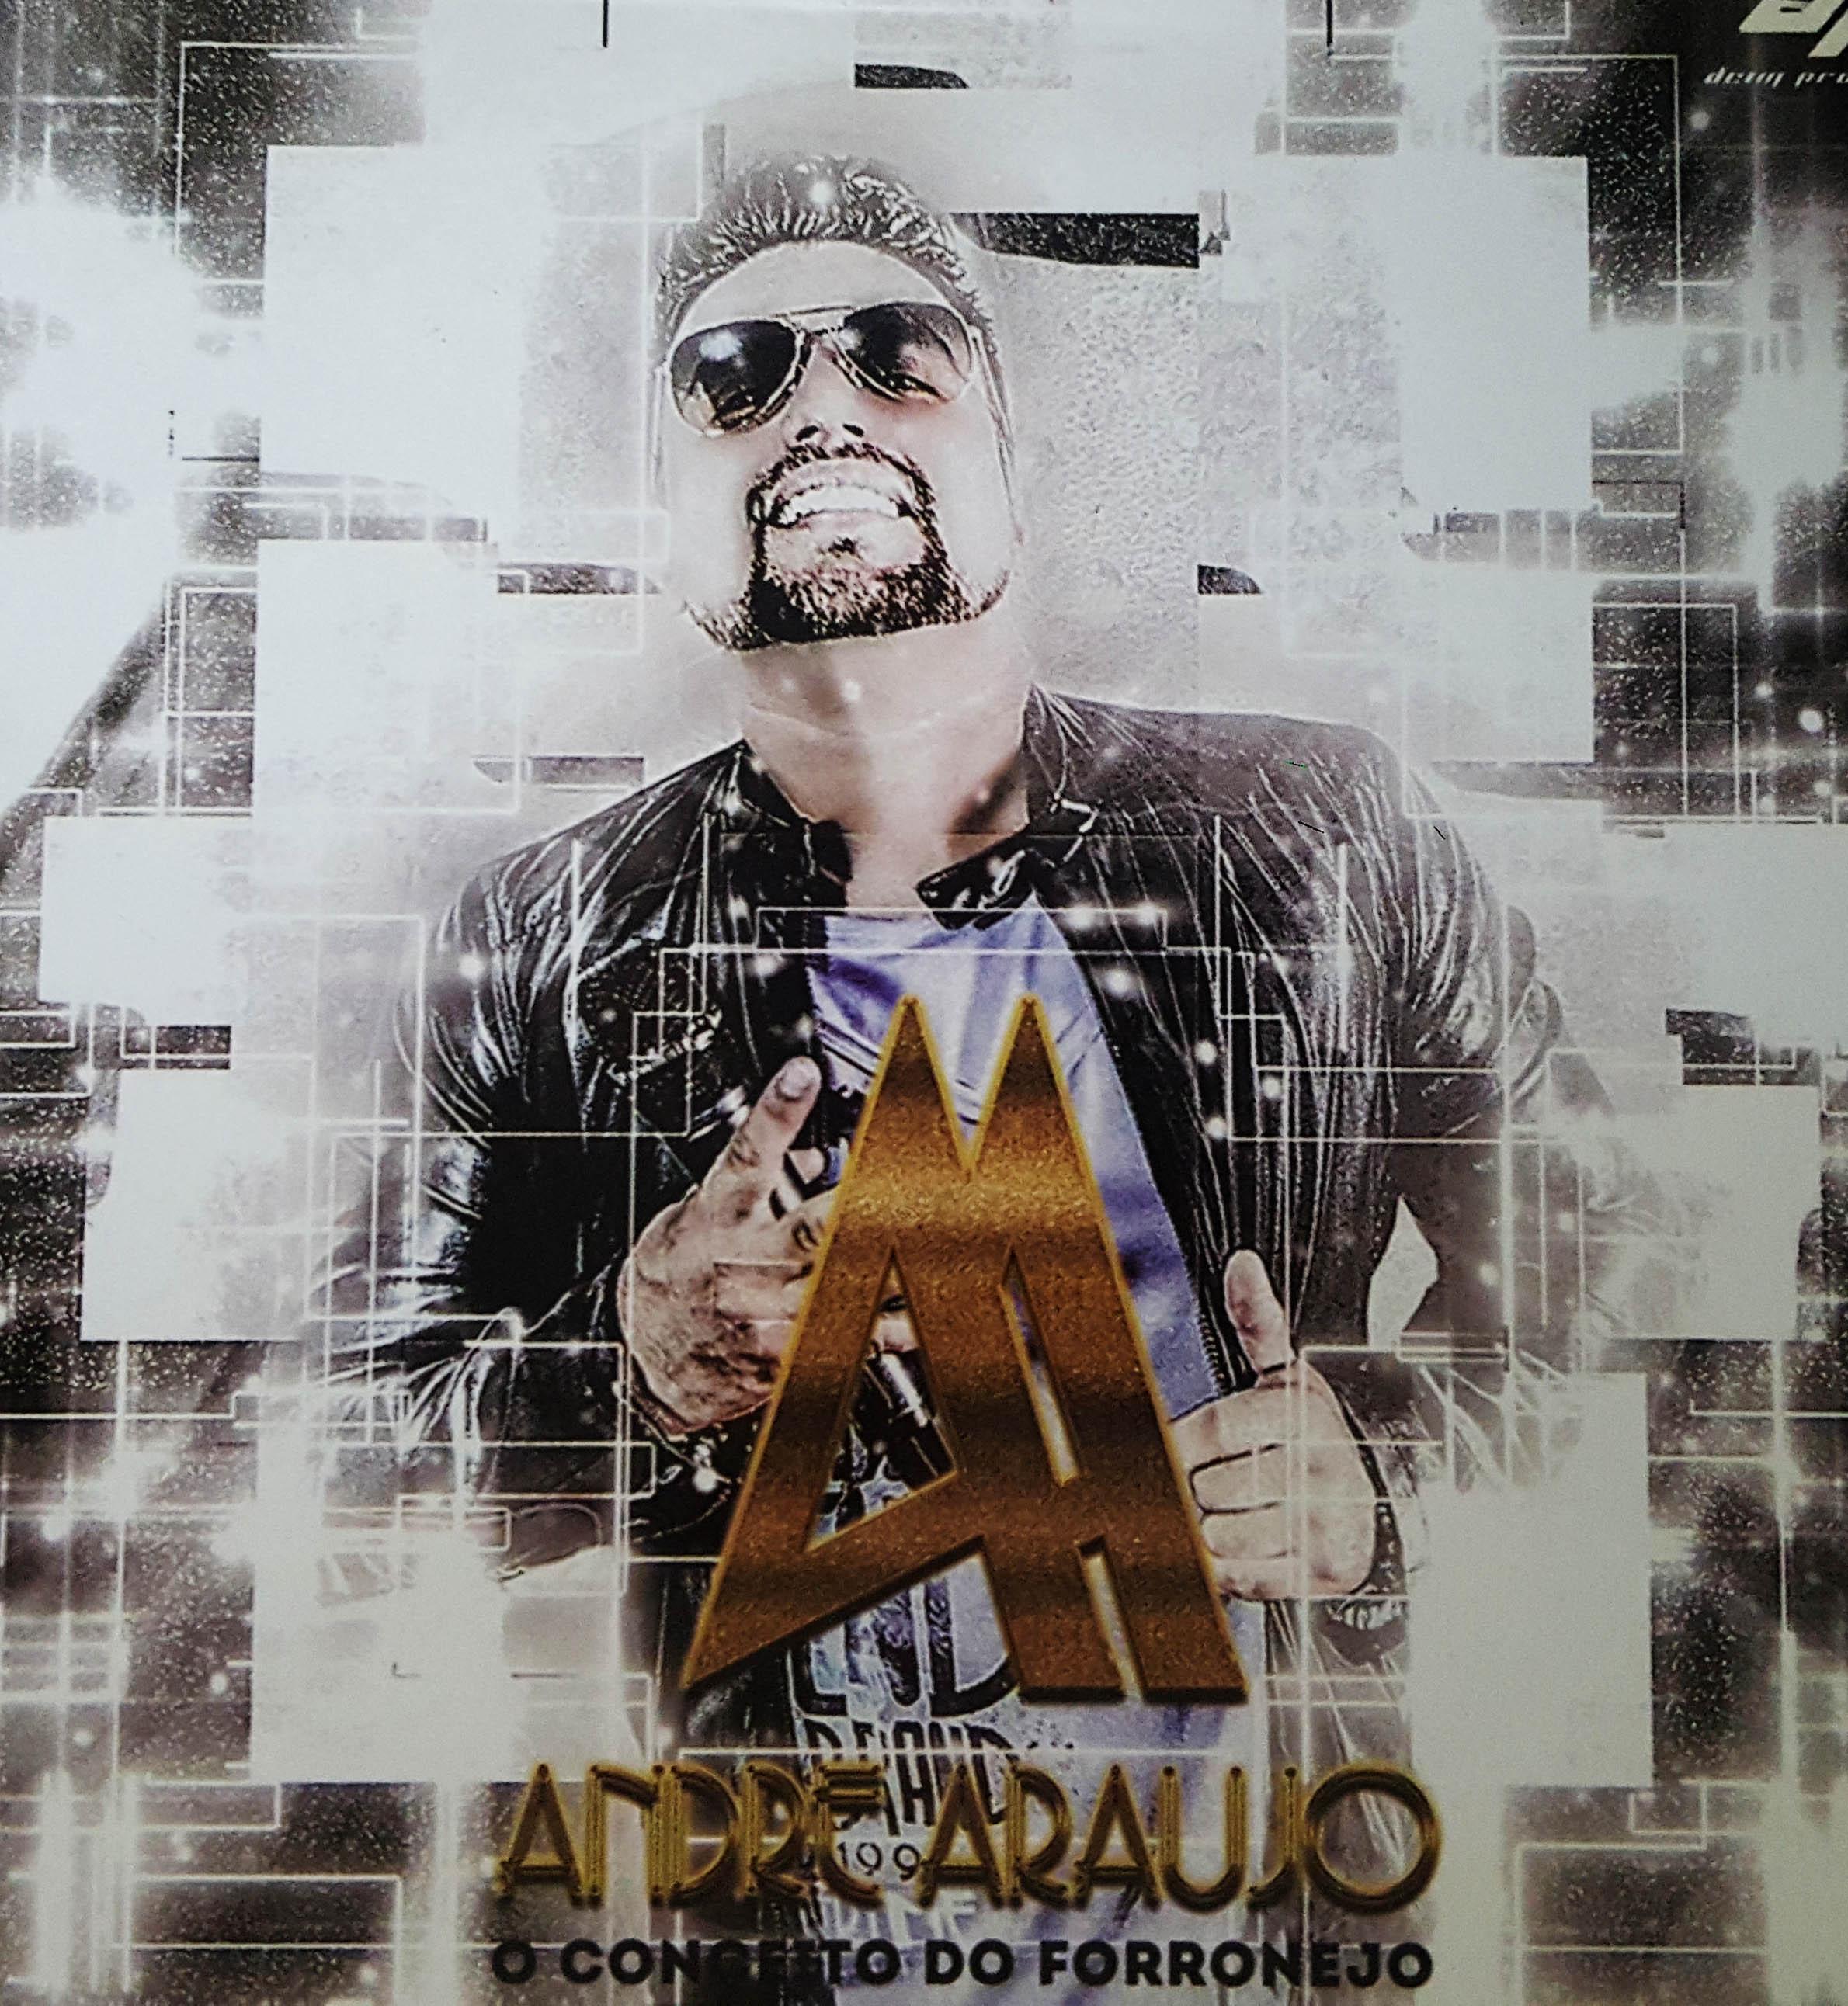 Andre Araújo